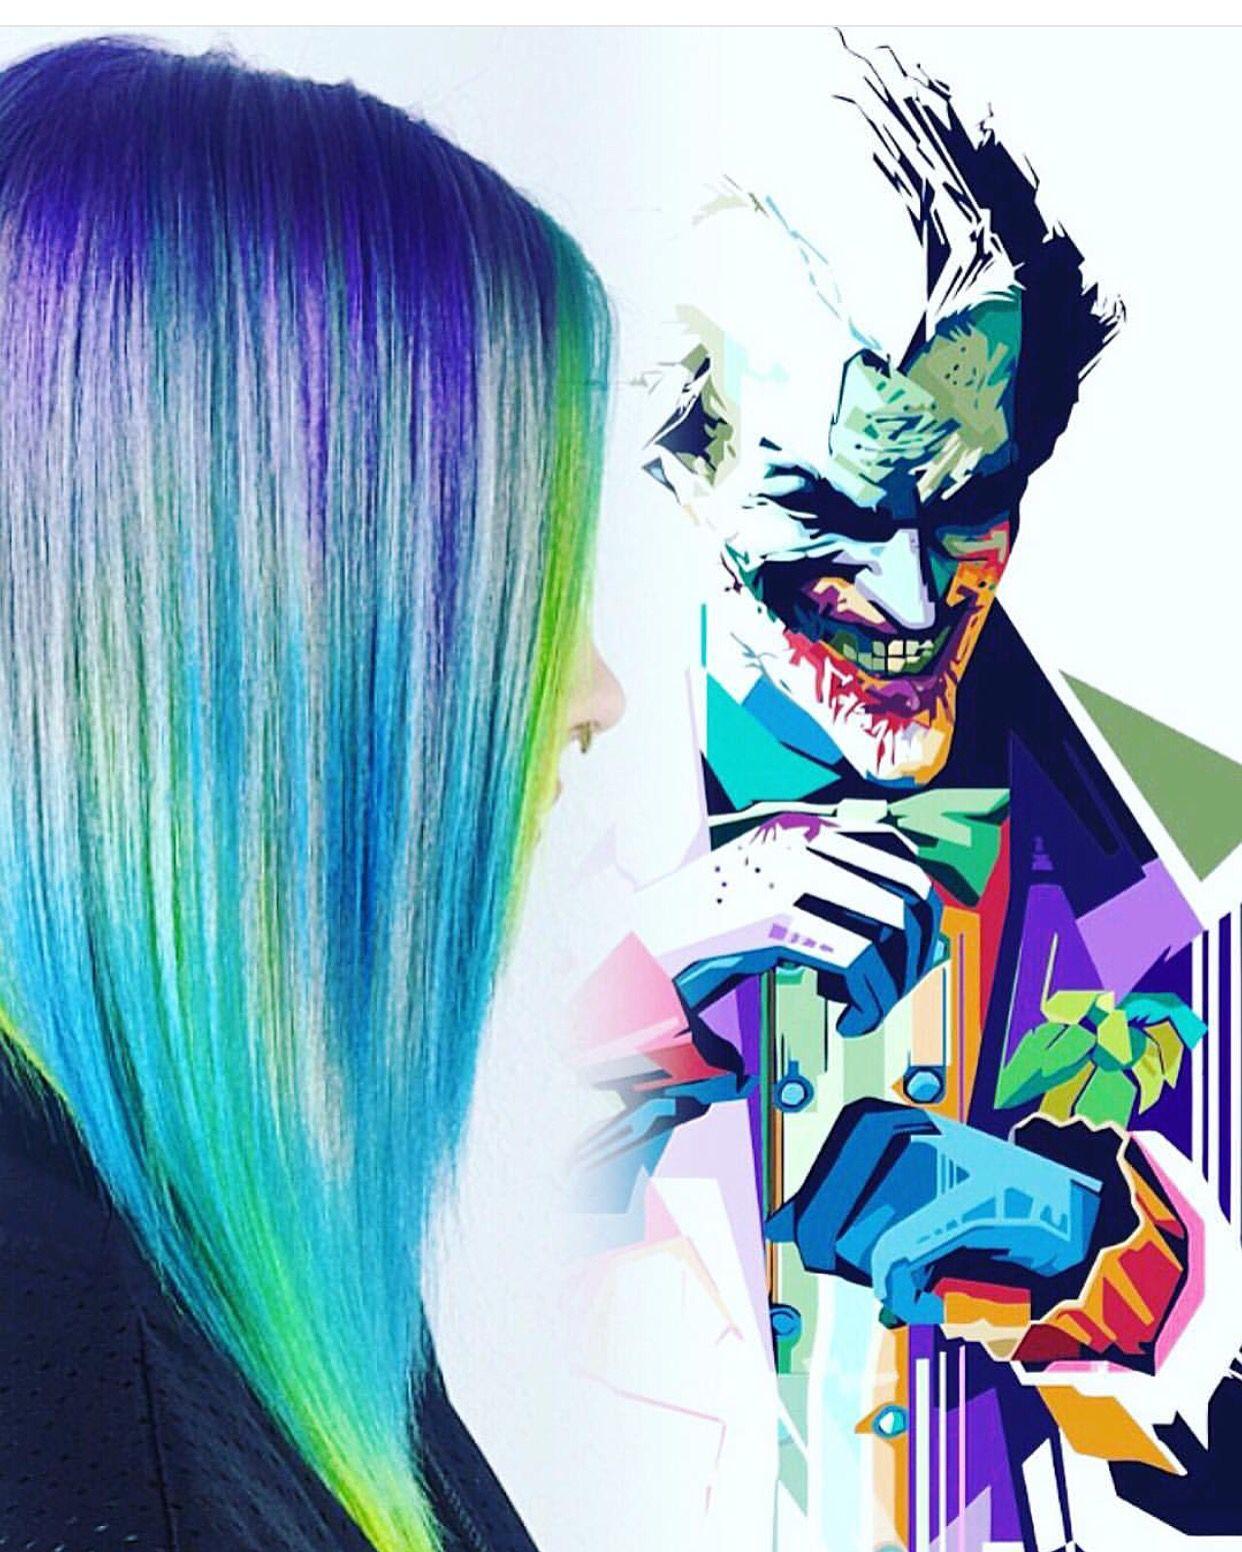 Art color hair - Joker S Wild By Rickey Zito Interpretive Hair Art Rainbow Hair Painting Hotonbeauty Com